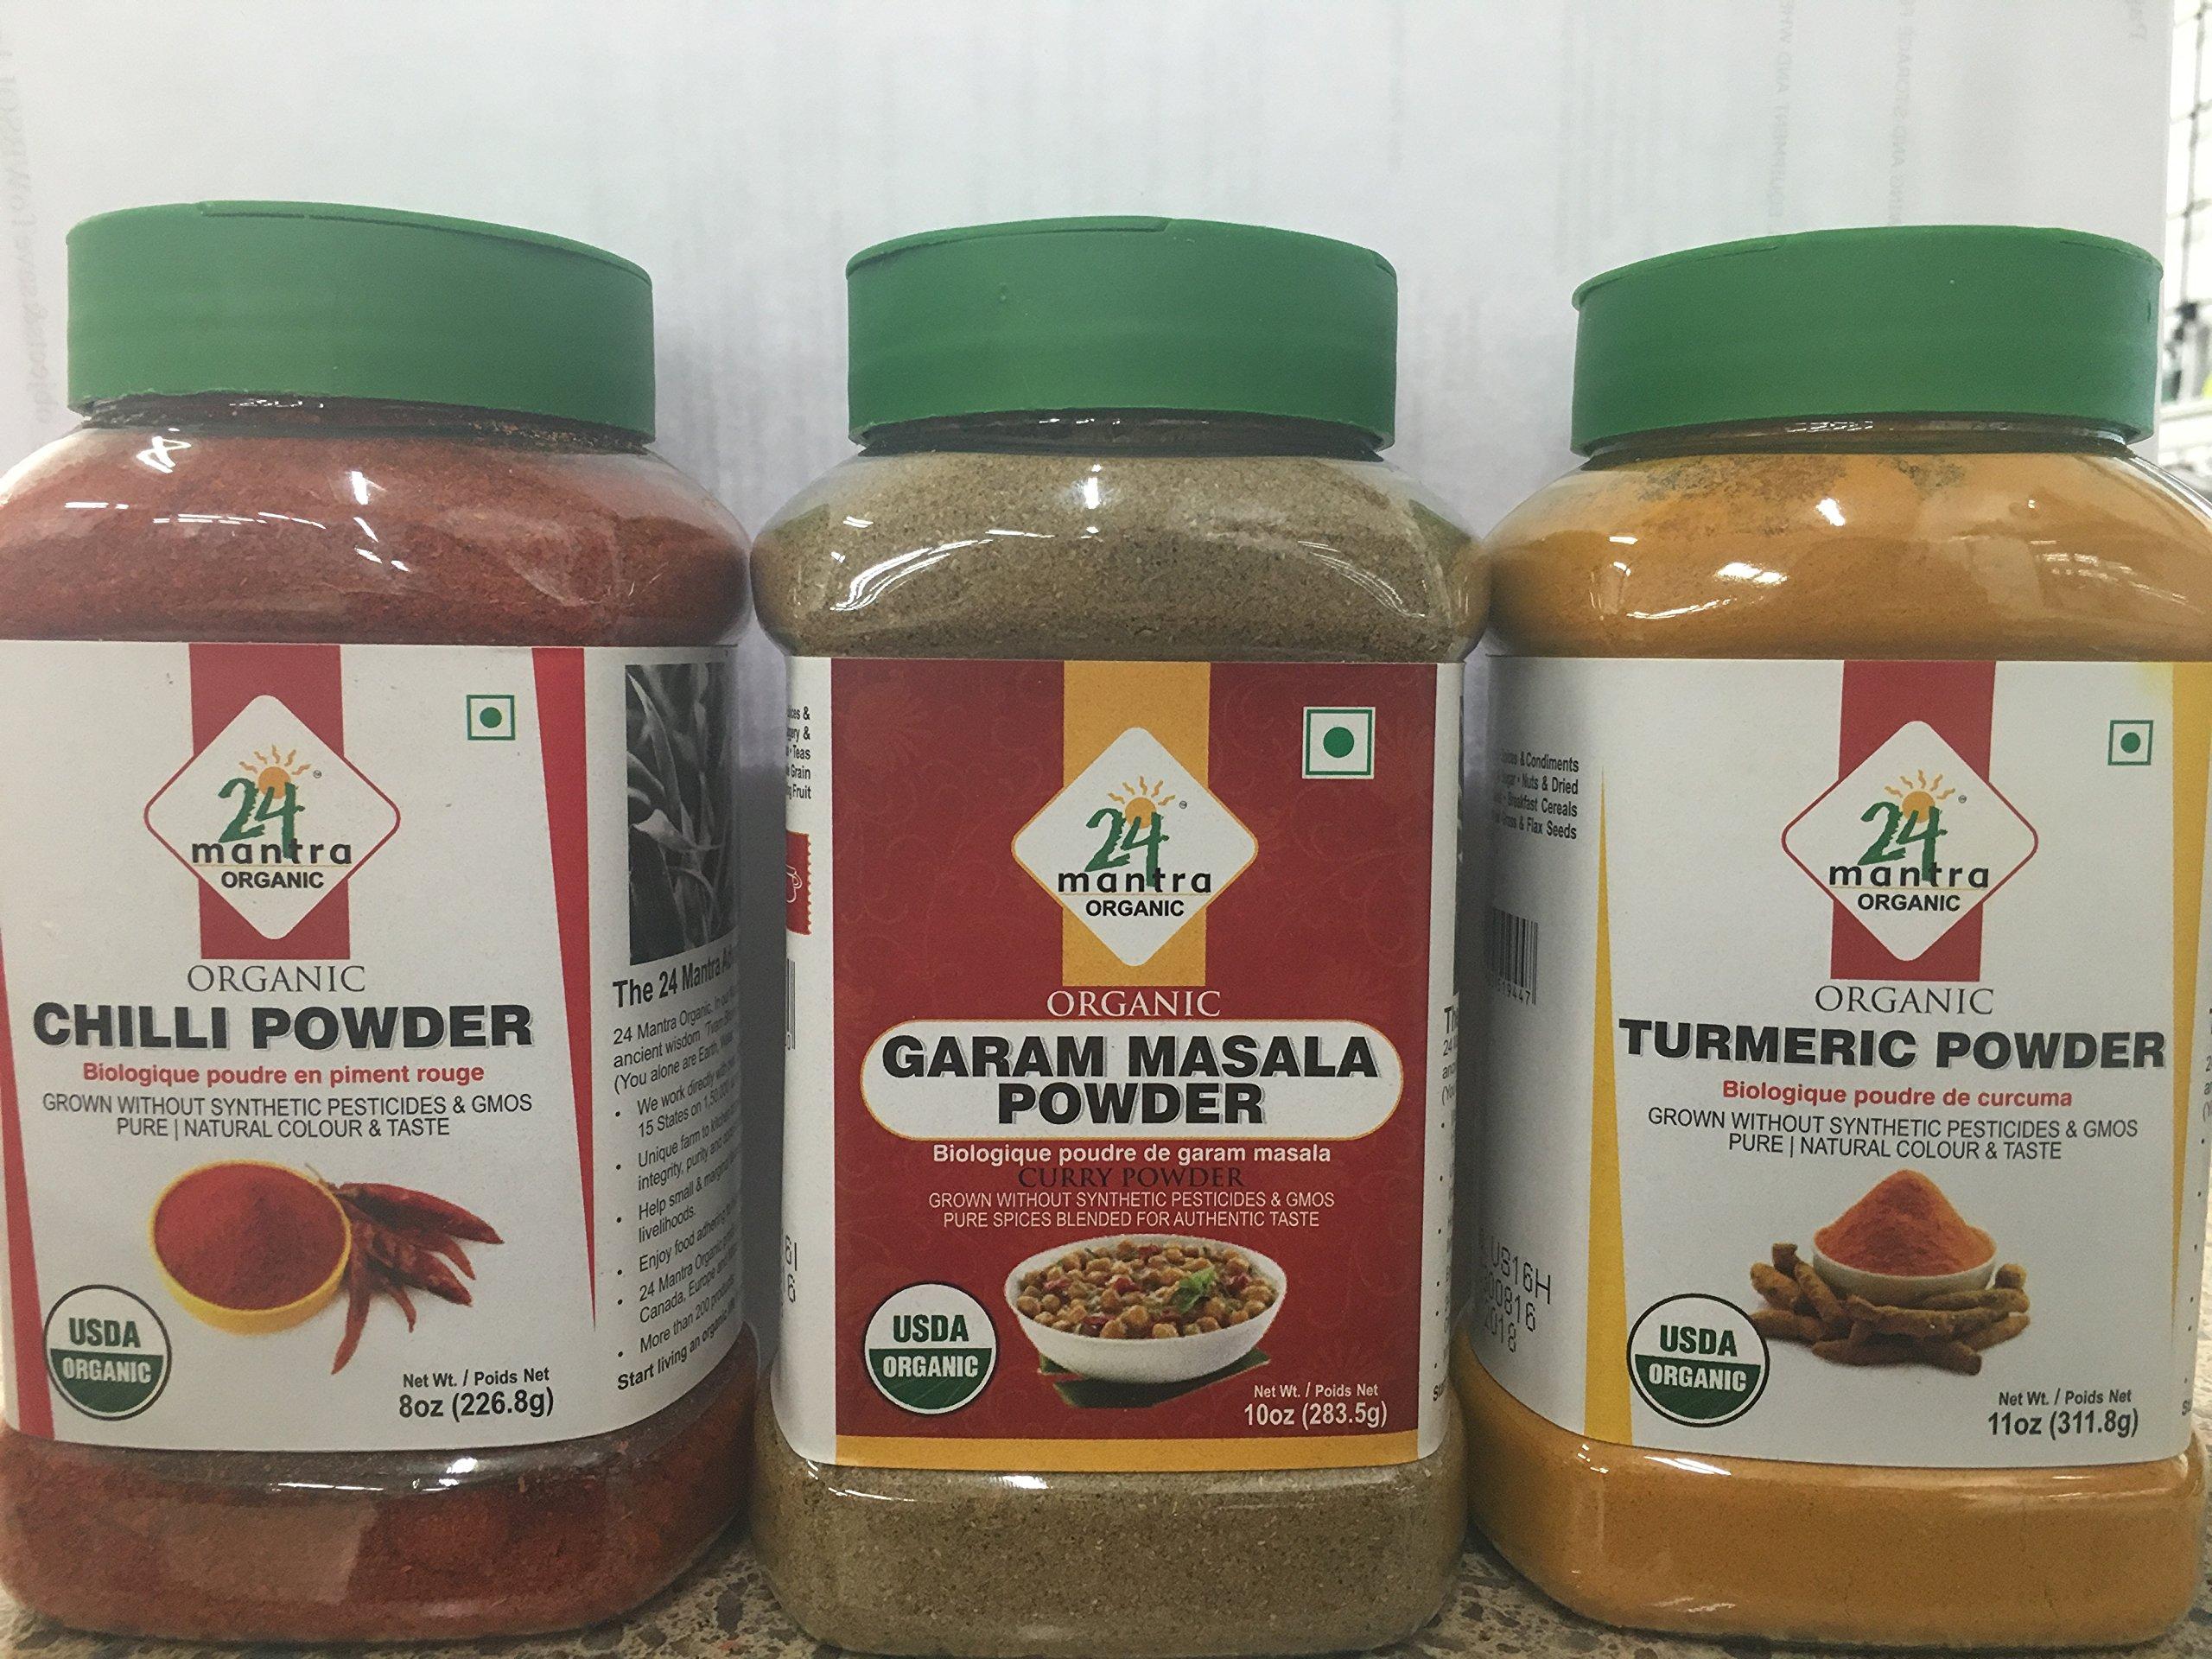 Organic Combo Spice Pack in Jars - Turmeric Powder (11 Oz) , Chilli Powder (8 oz) & Garam Masala Powder (10 oz)